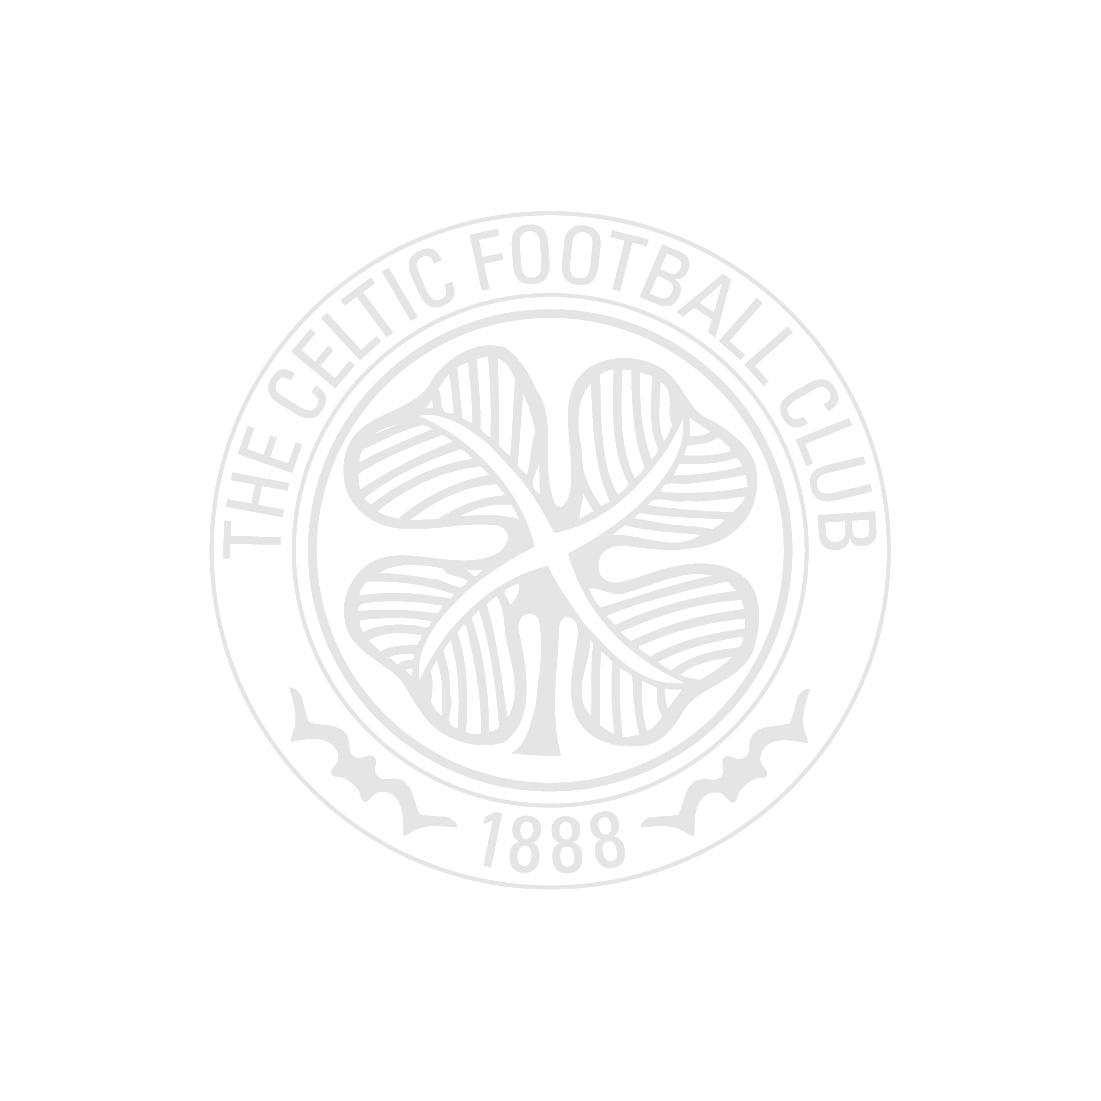 Celtic Green Face Bracelet Watch - Online Exclusive